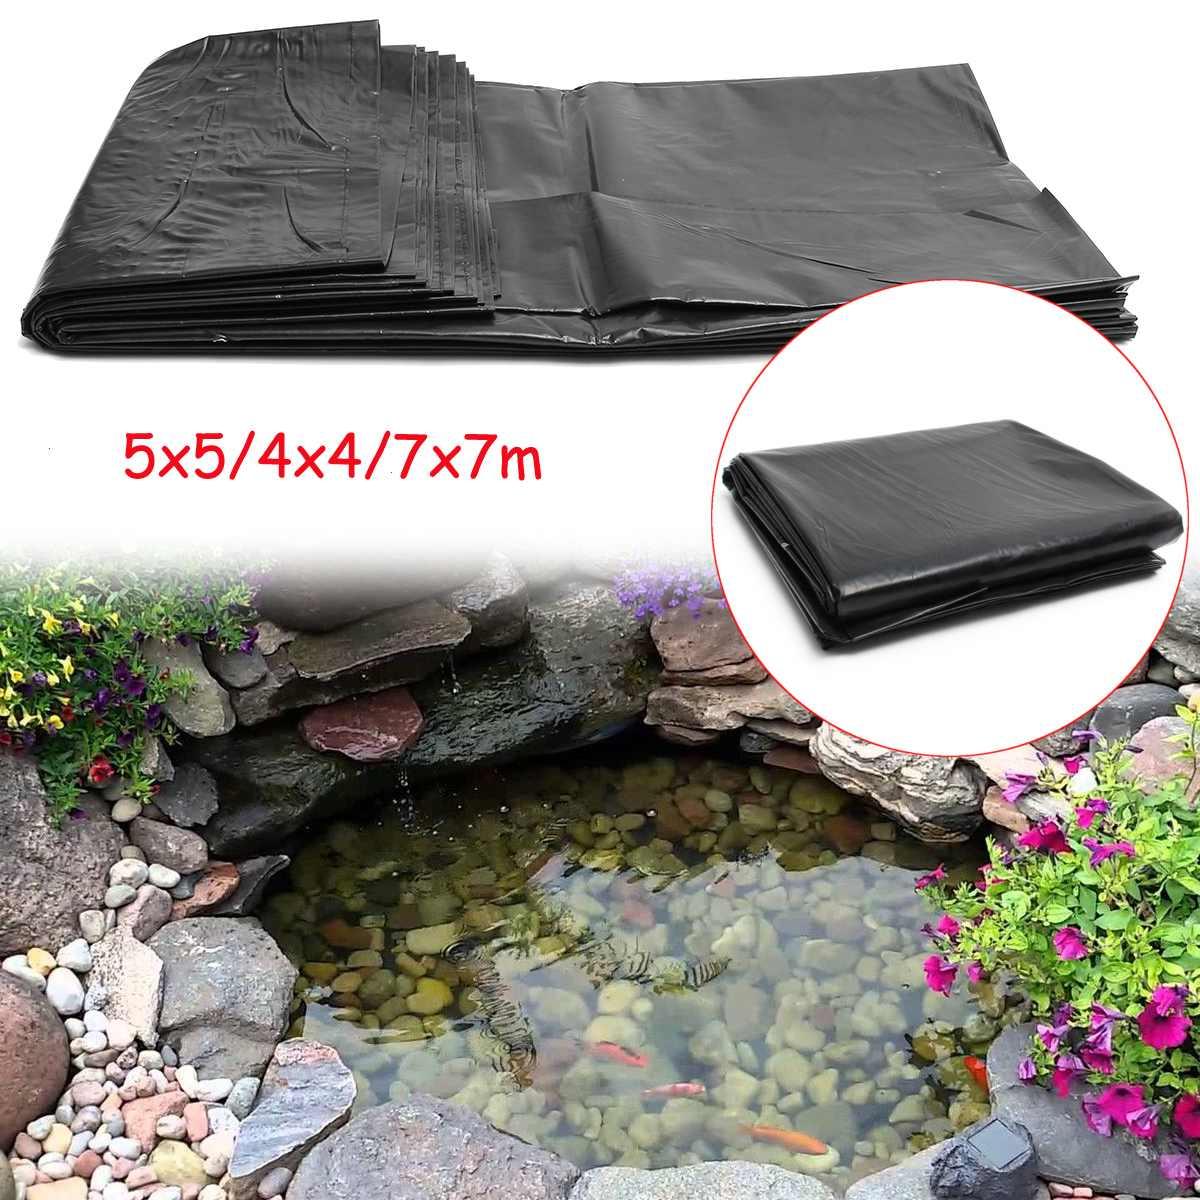 7x7m / 5x5m / 4x4m HDPE revestimiento de estanque de peces jardín estanque paisajismo piscina reforzada gruesa resistente impermeable revestimiento de membrana tela